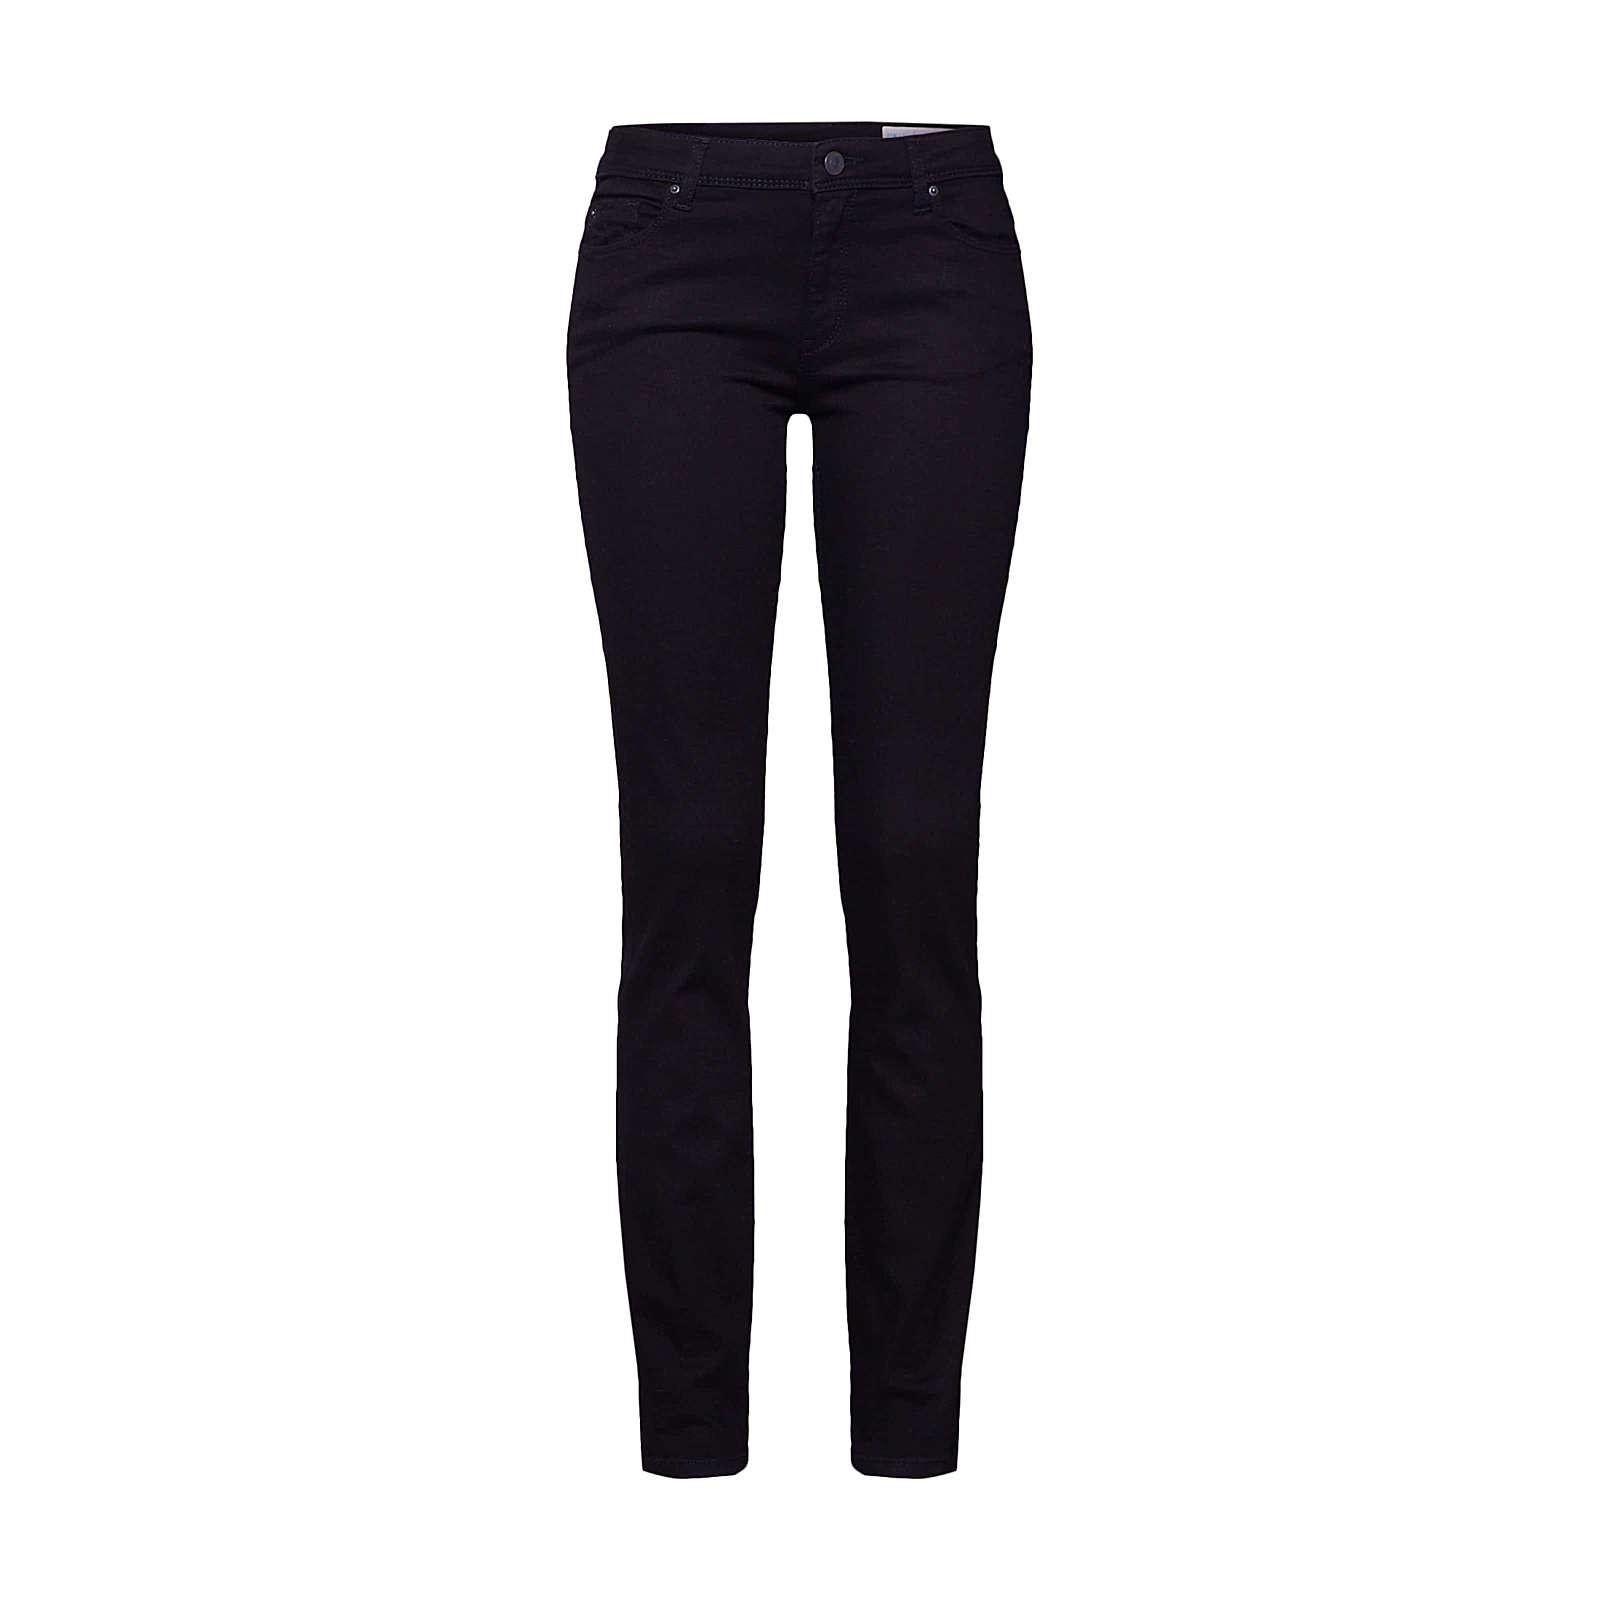 ESPRIT Jeans OCS MR Straight Jeanshosen schwarz Damen Gr. W28/L30